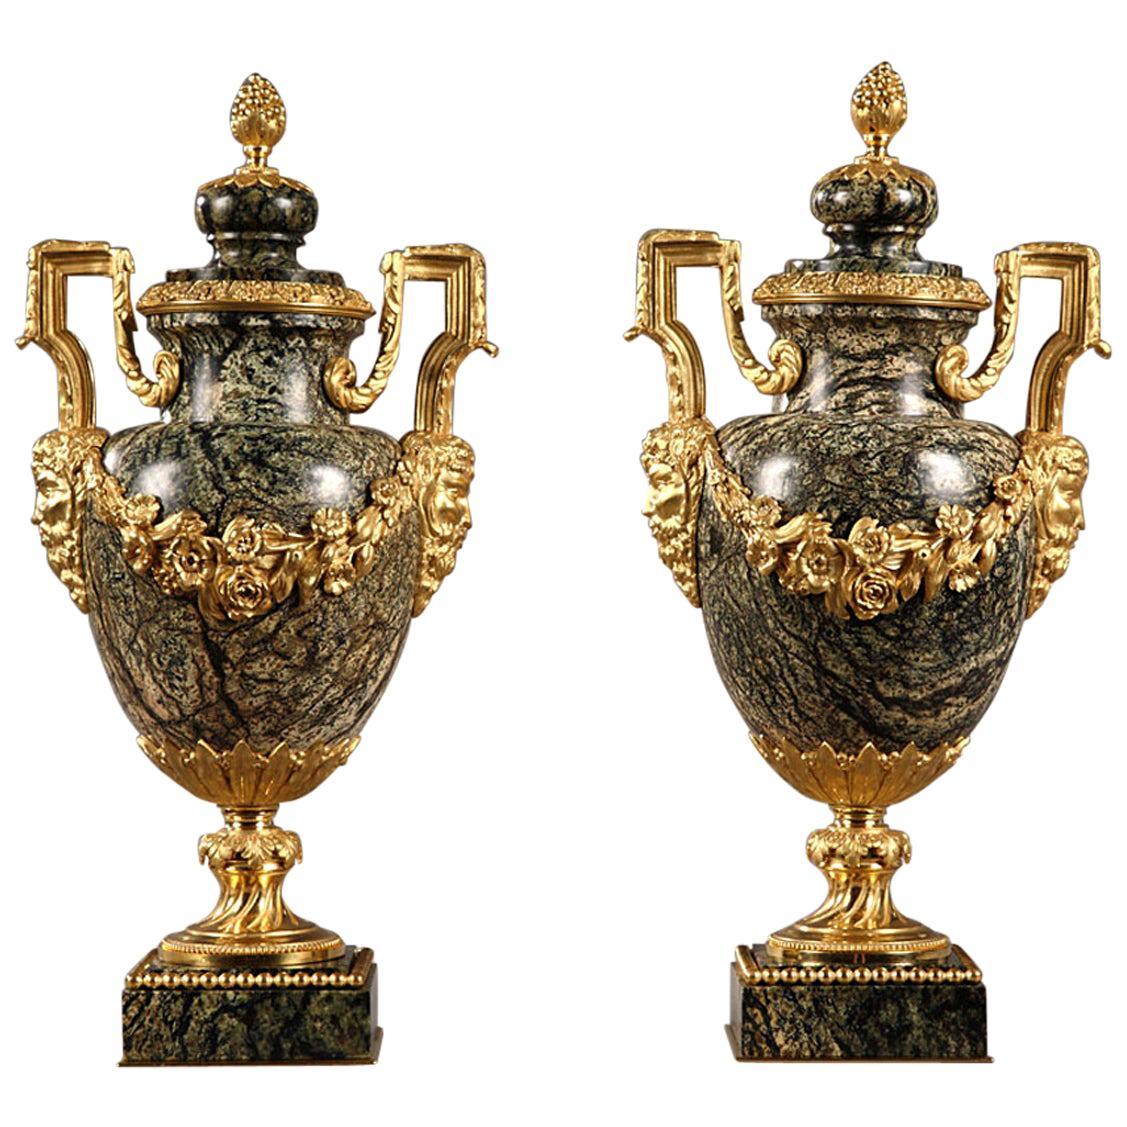 Pair of Napoleon III Marble and Gilt Bronze Vases, 19th Century